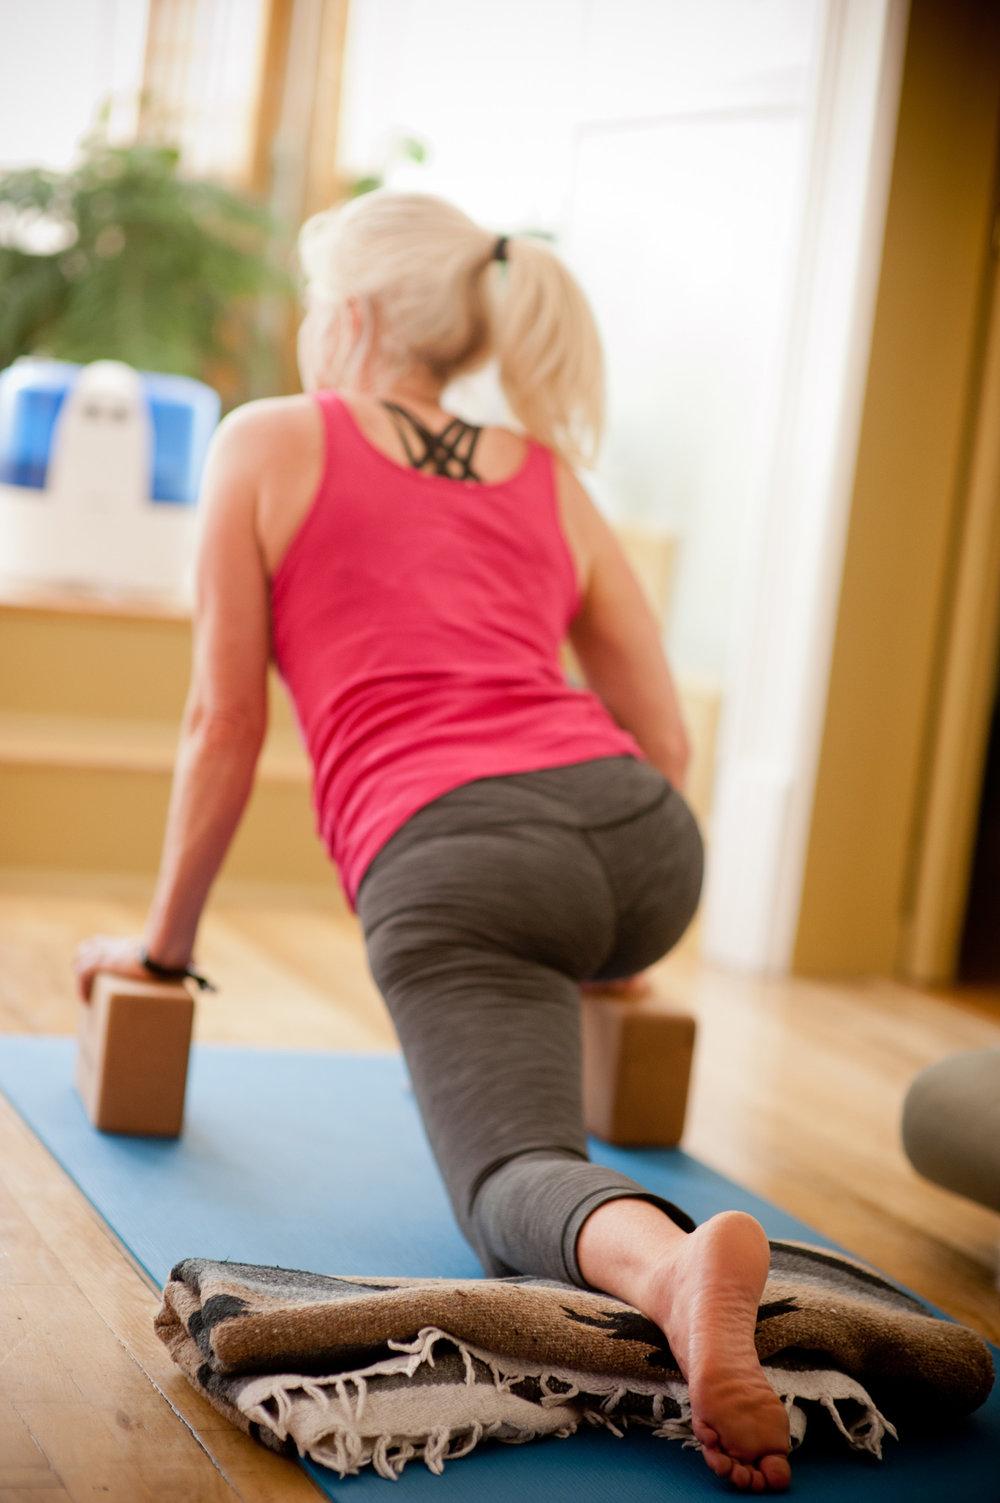 telluride-yin-yoga-teacher-training-kali-basman-durga-yoga-8.jpg